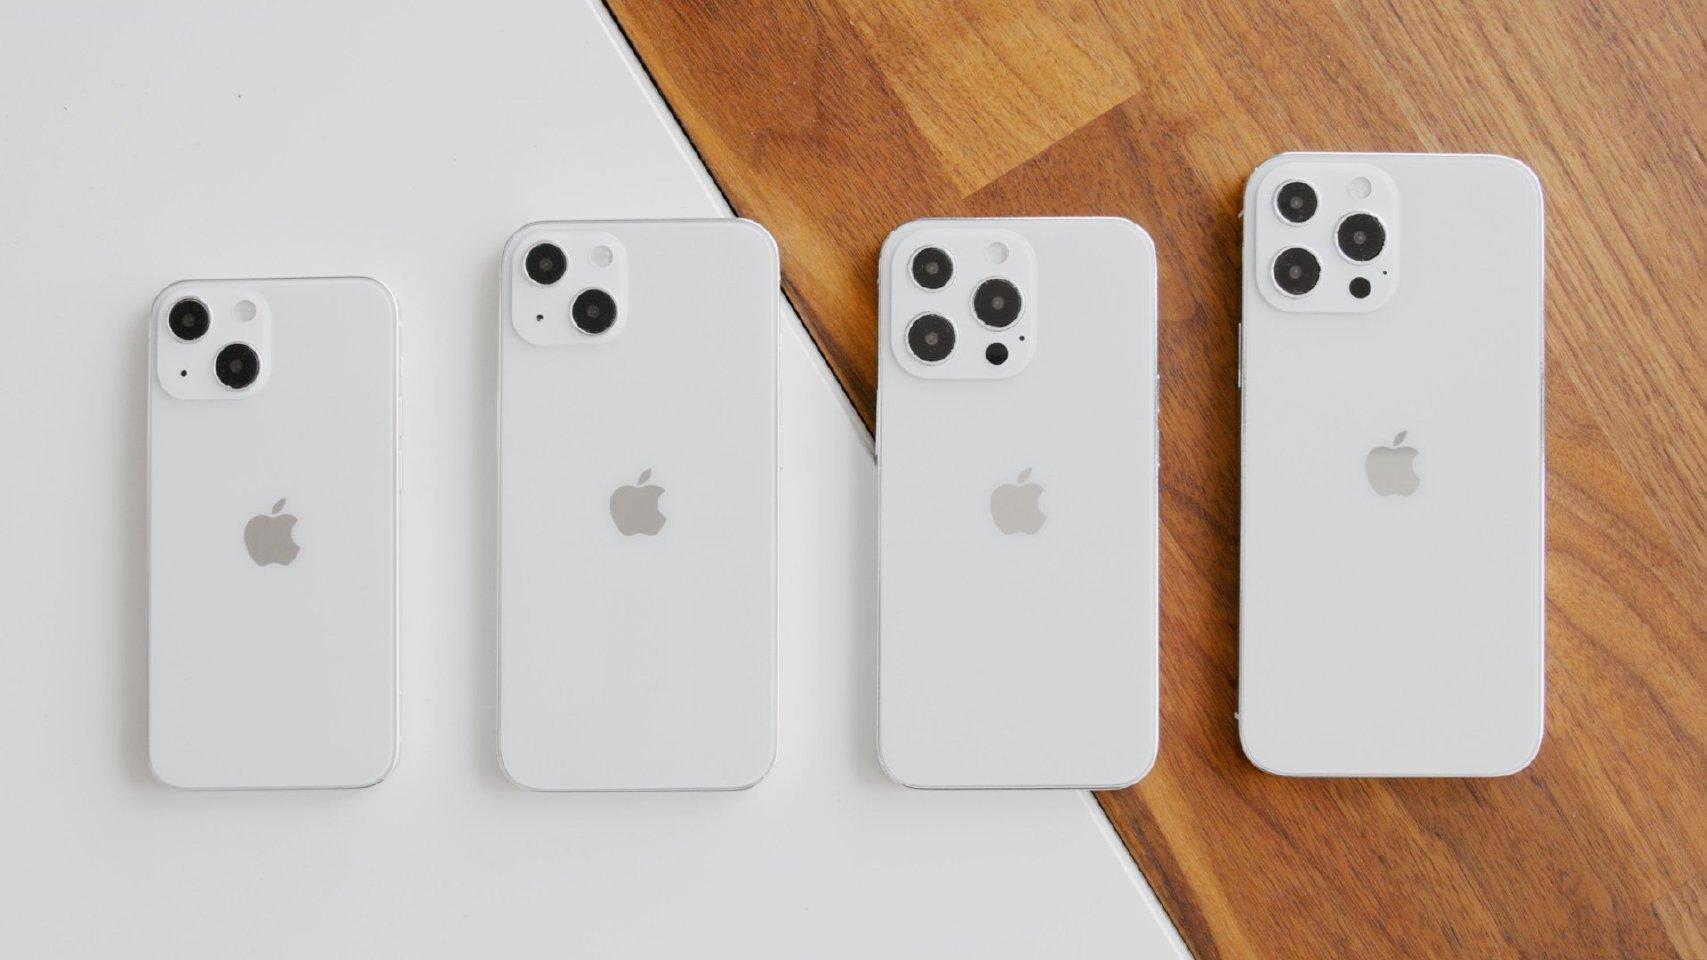 iPhone13全方位曝光,新充电方式却被吐槽